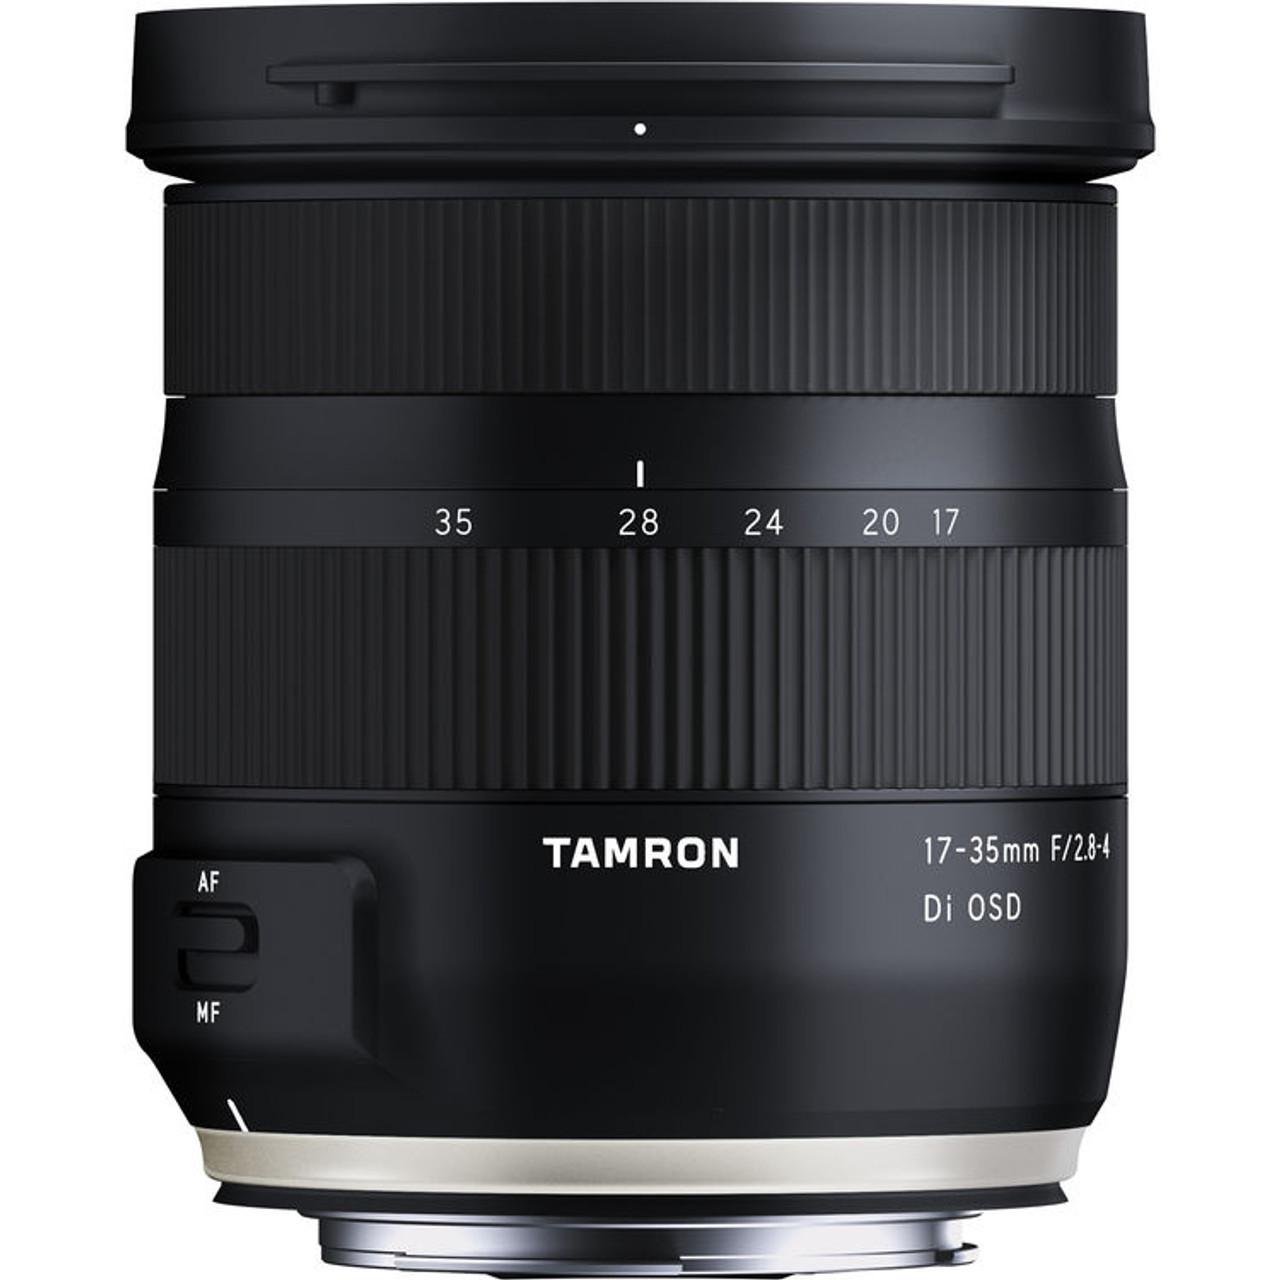 Tamron 17-35mm f/2.8-4 DI OSD Lens for Canon EF